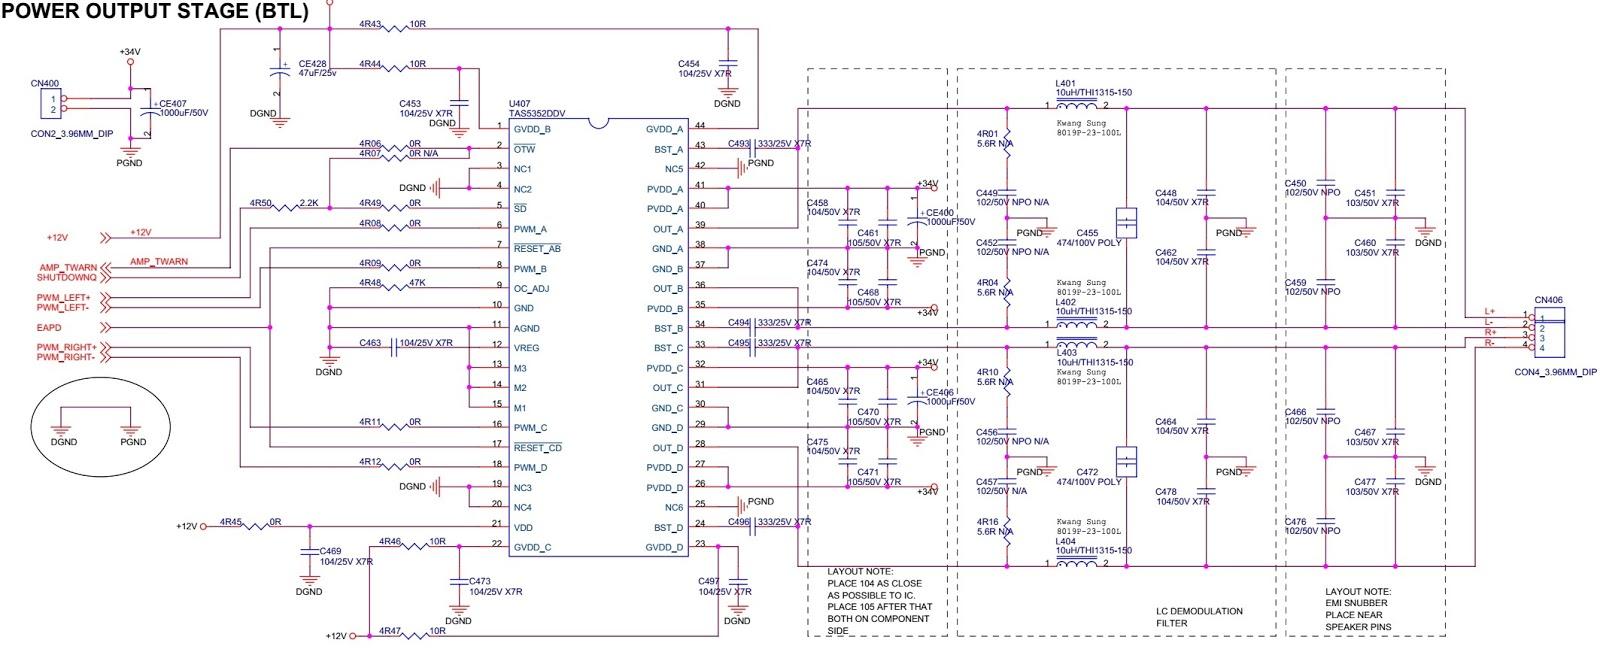 Harman Kardon Wiring Diagram 76160 06 Diagrams Boom Audio System Harness Sound Systems Autos Post Wheelchair Lift Schematic Harley